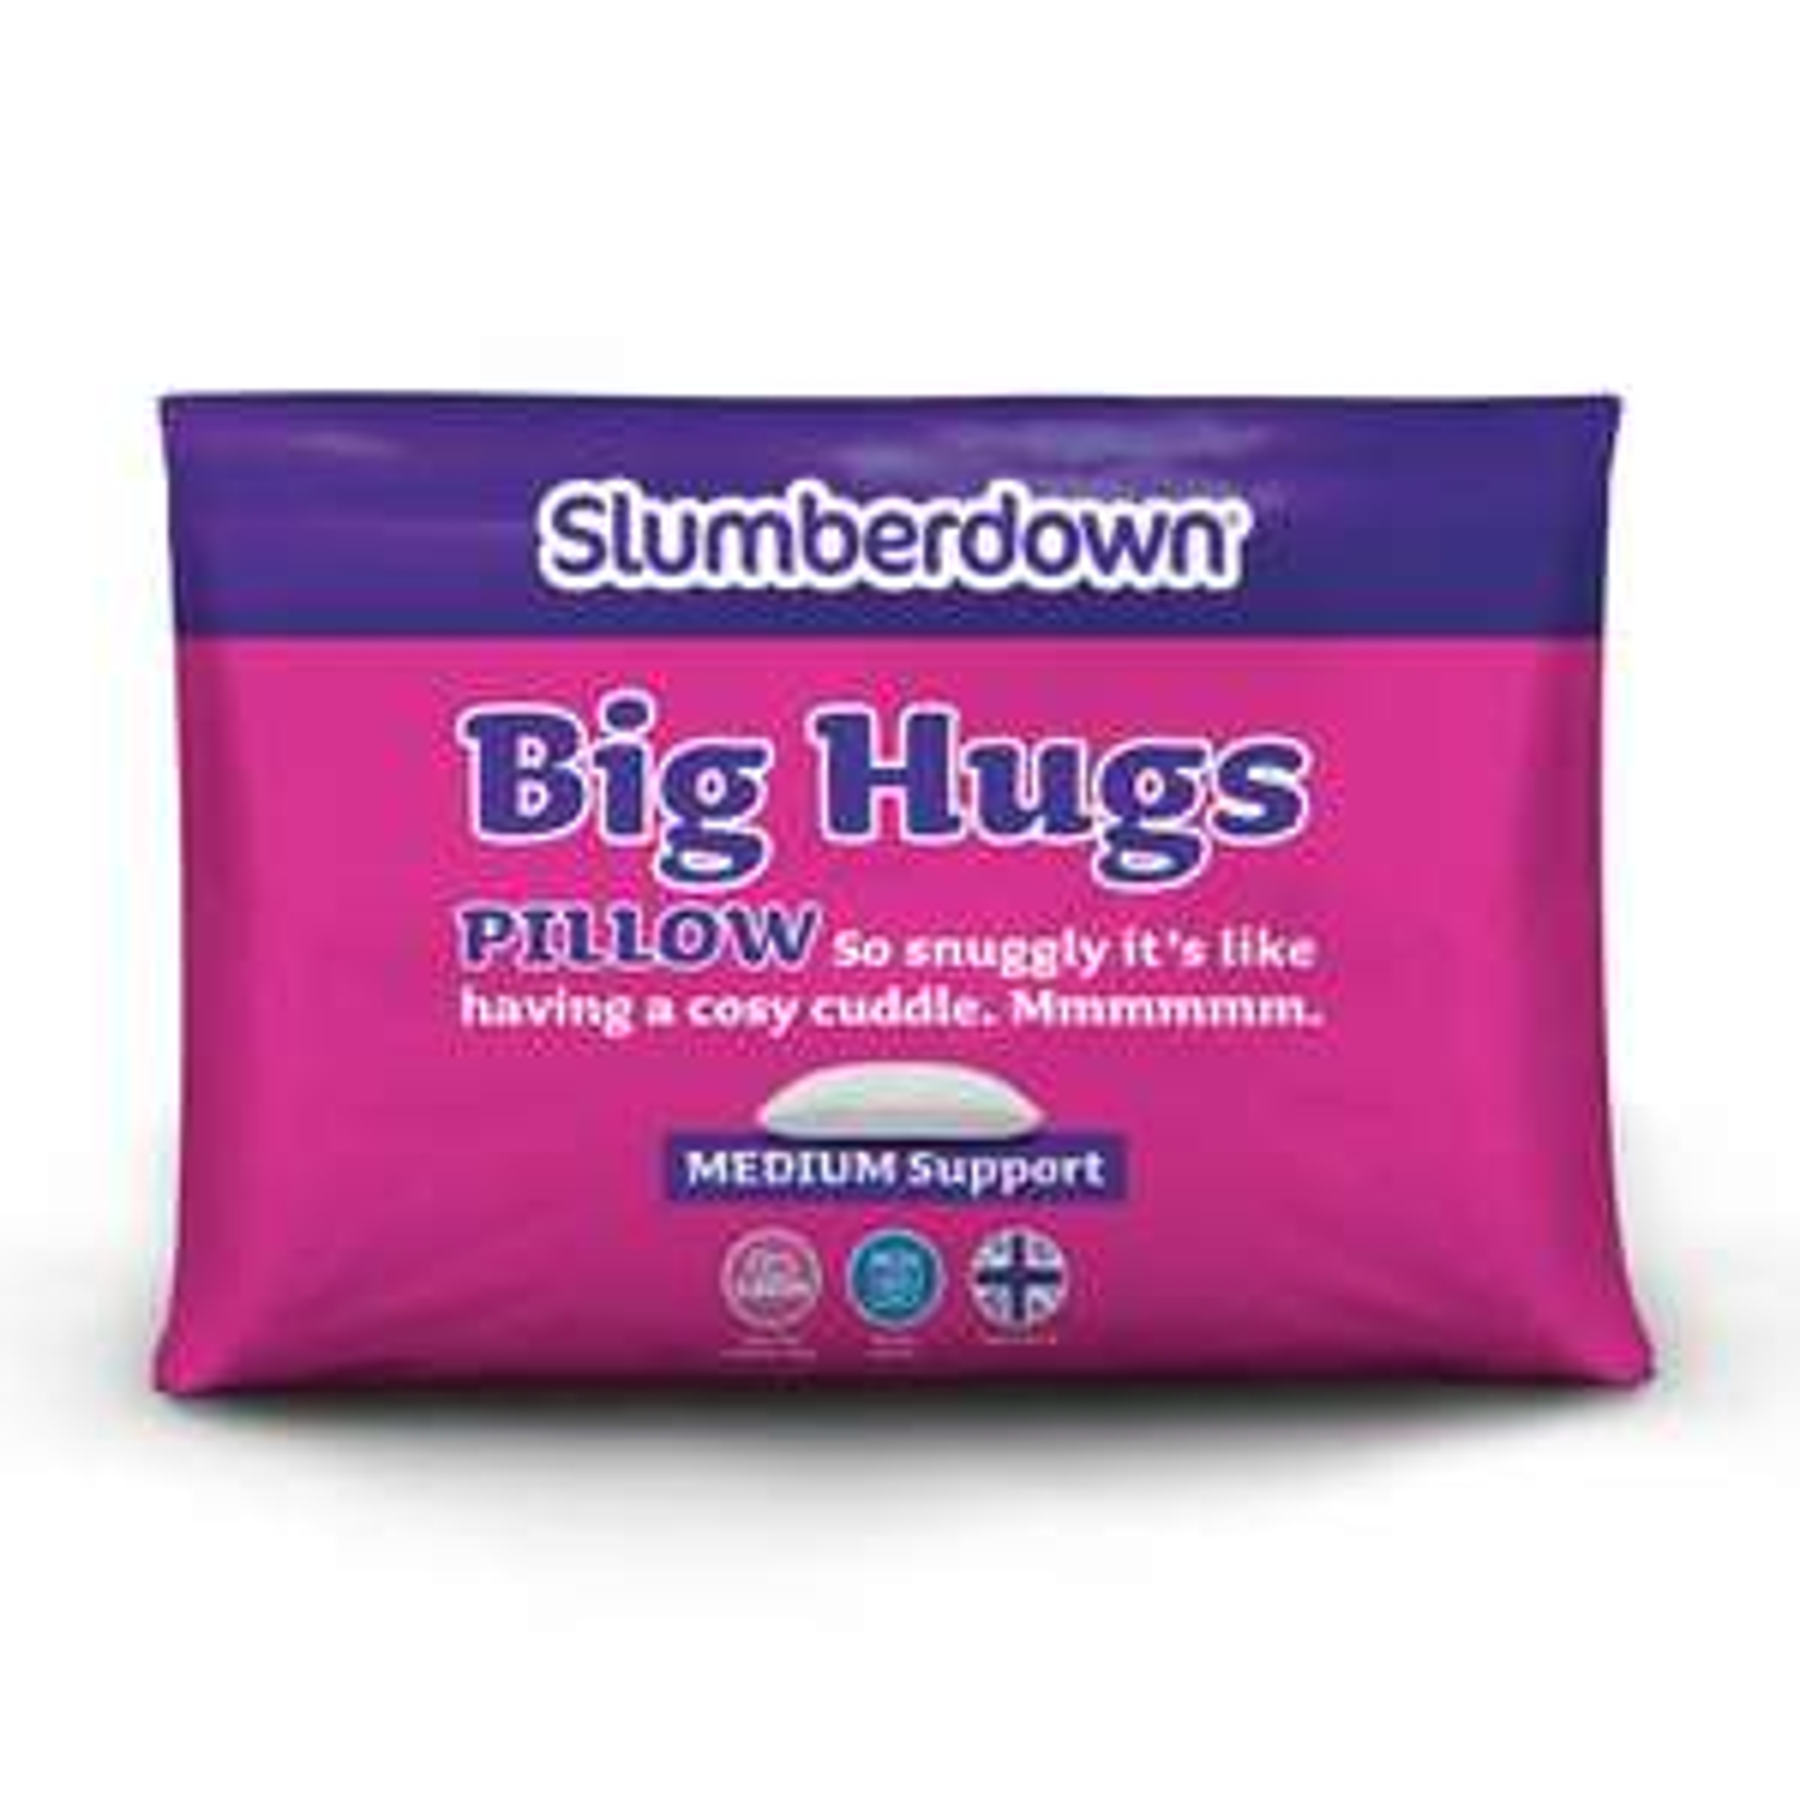 Four pillows £10.99 delivered - BOGOF deal @ Sleepseeker